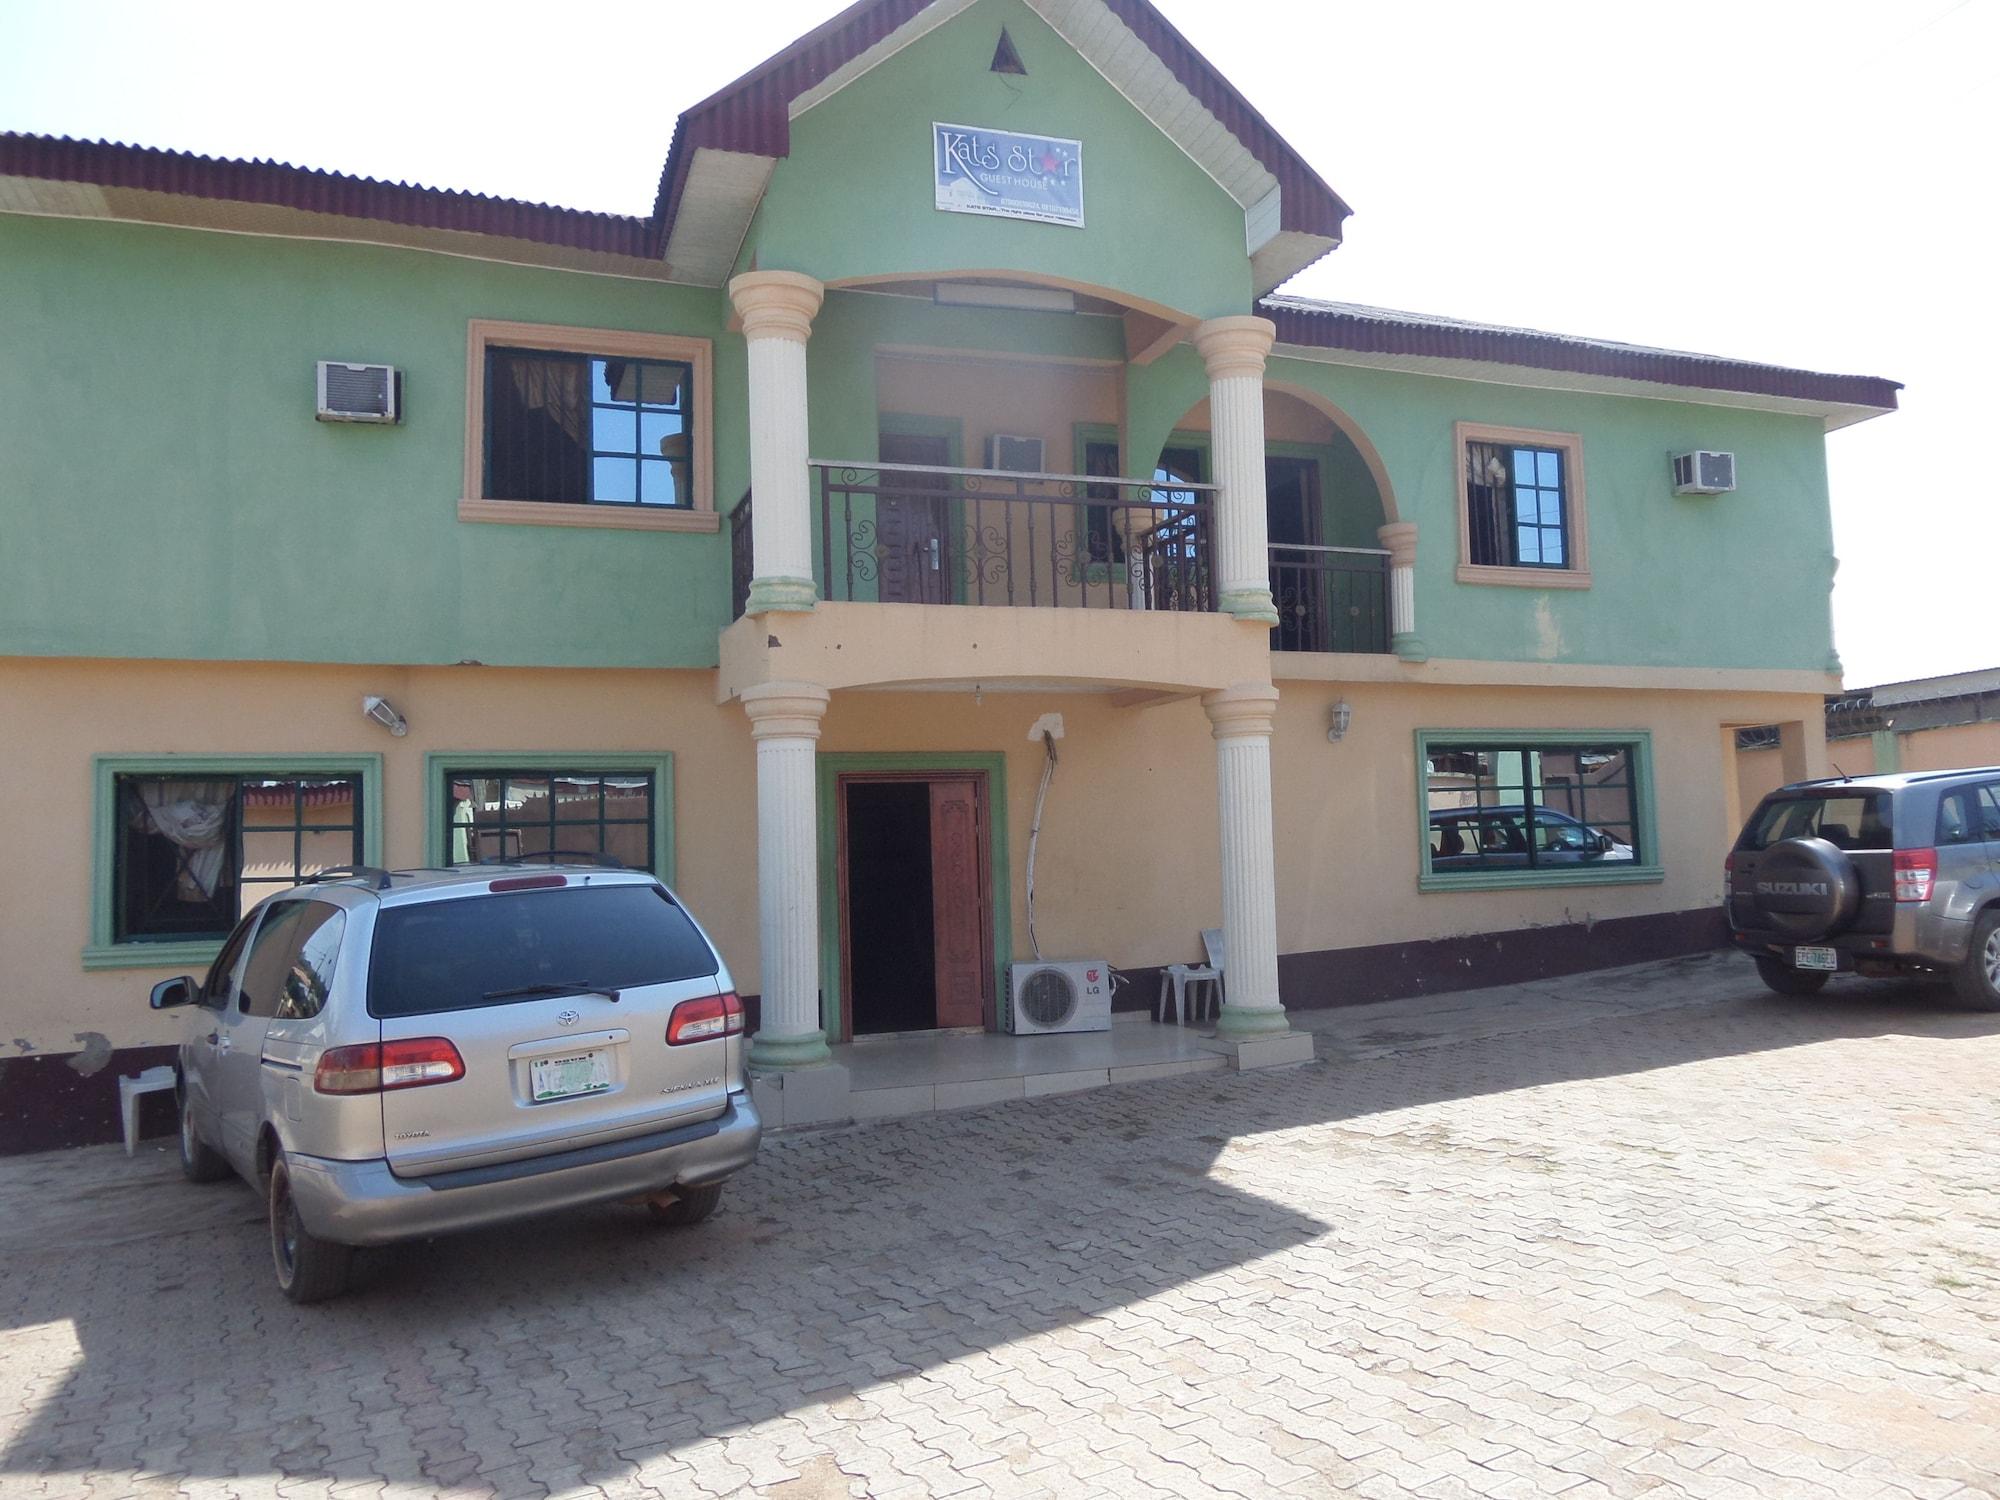 Kats Star Guest House, Obafemi-Owode